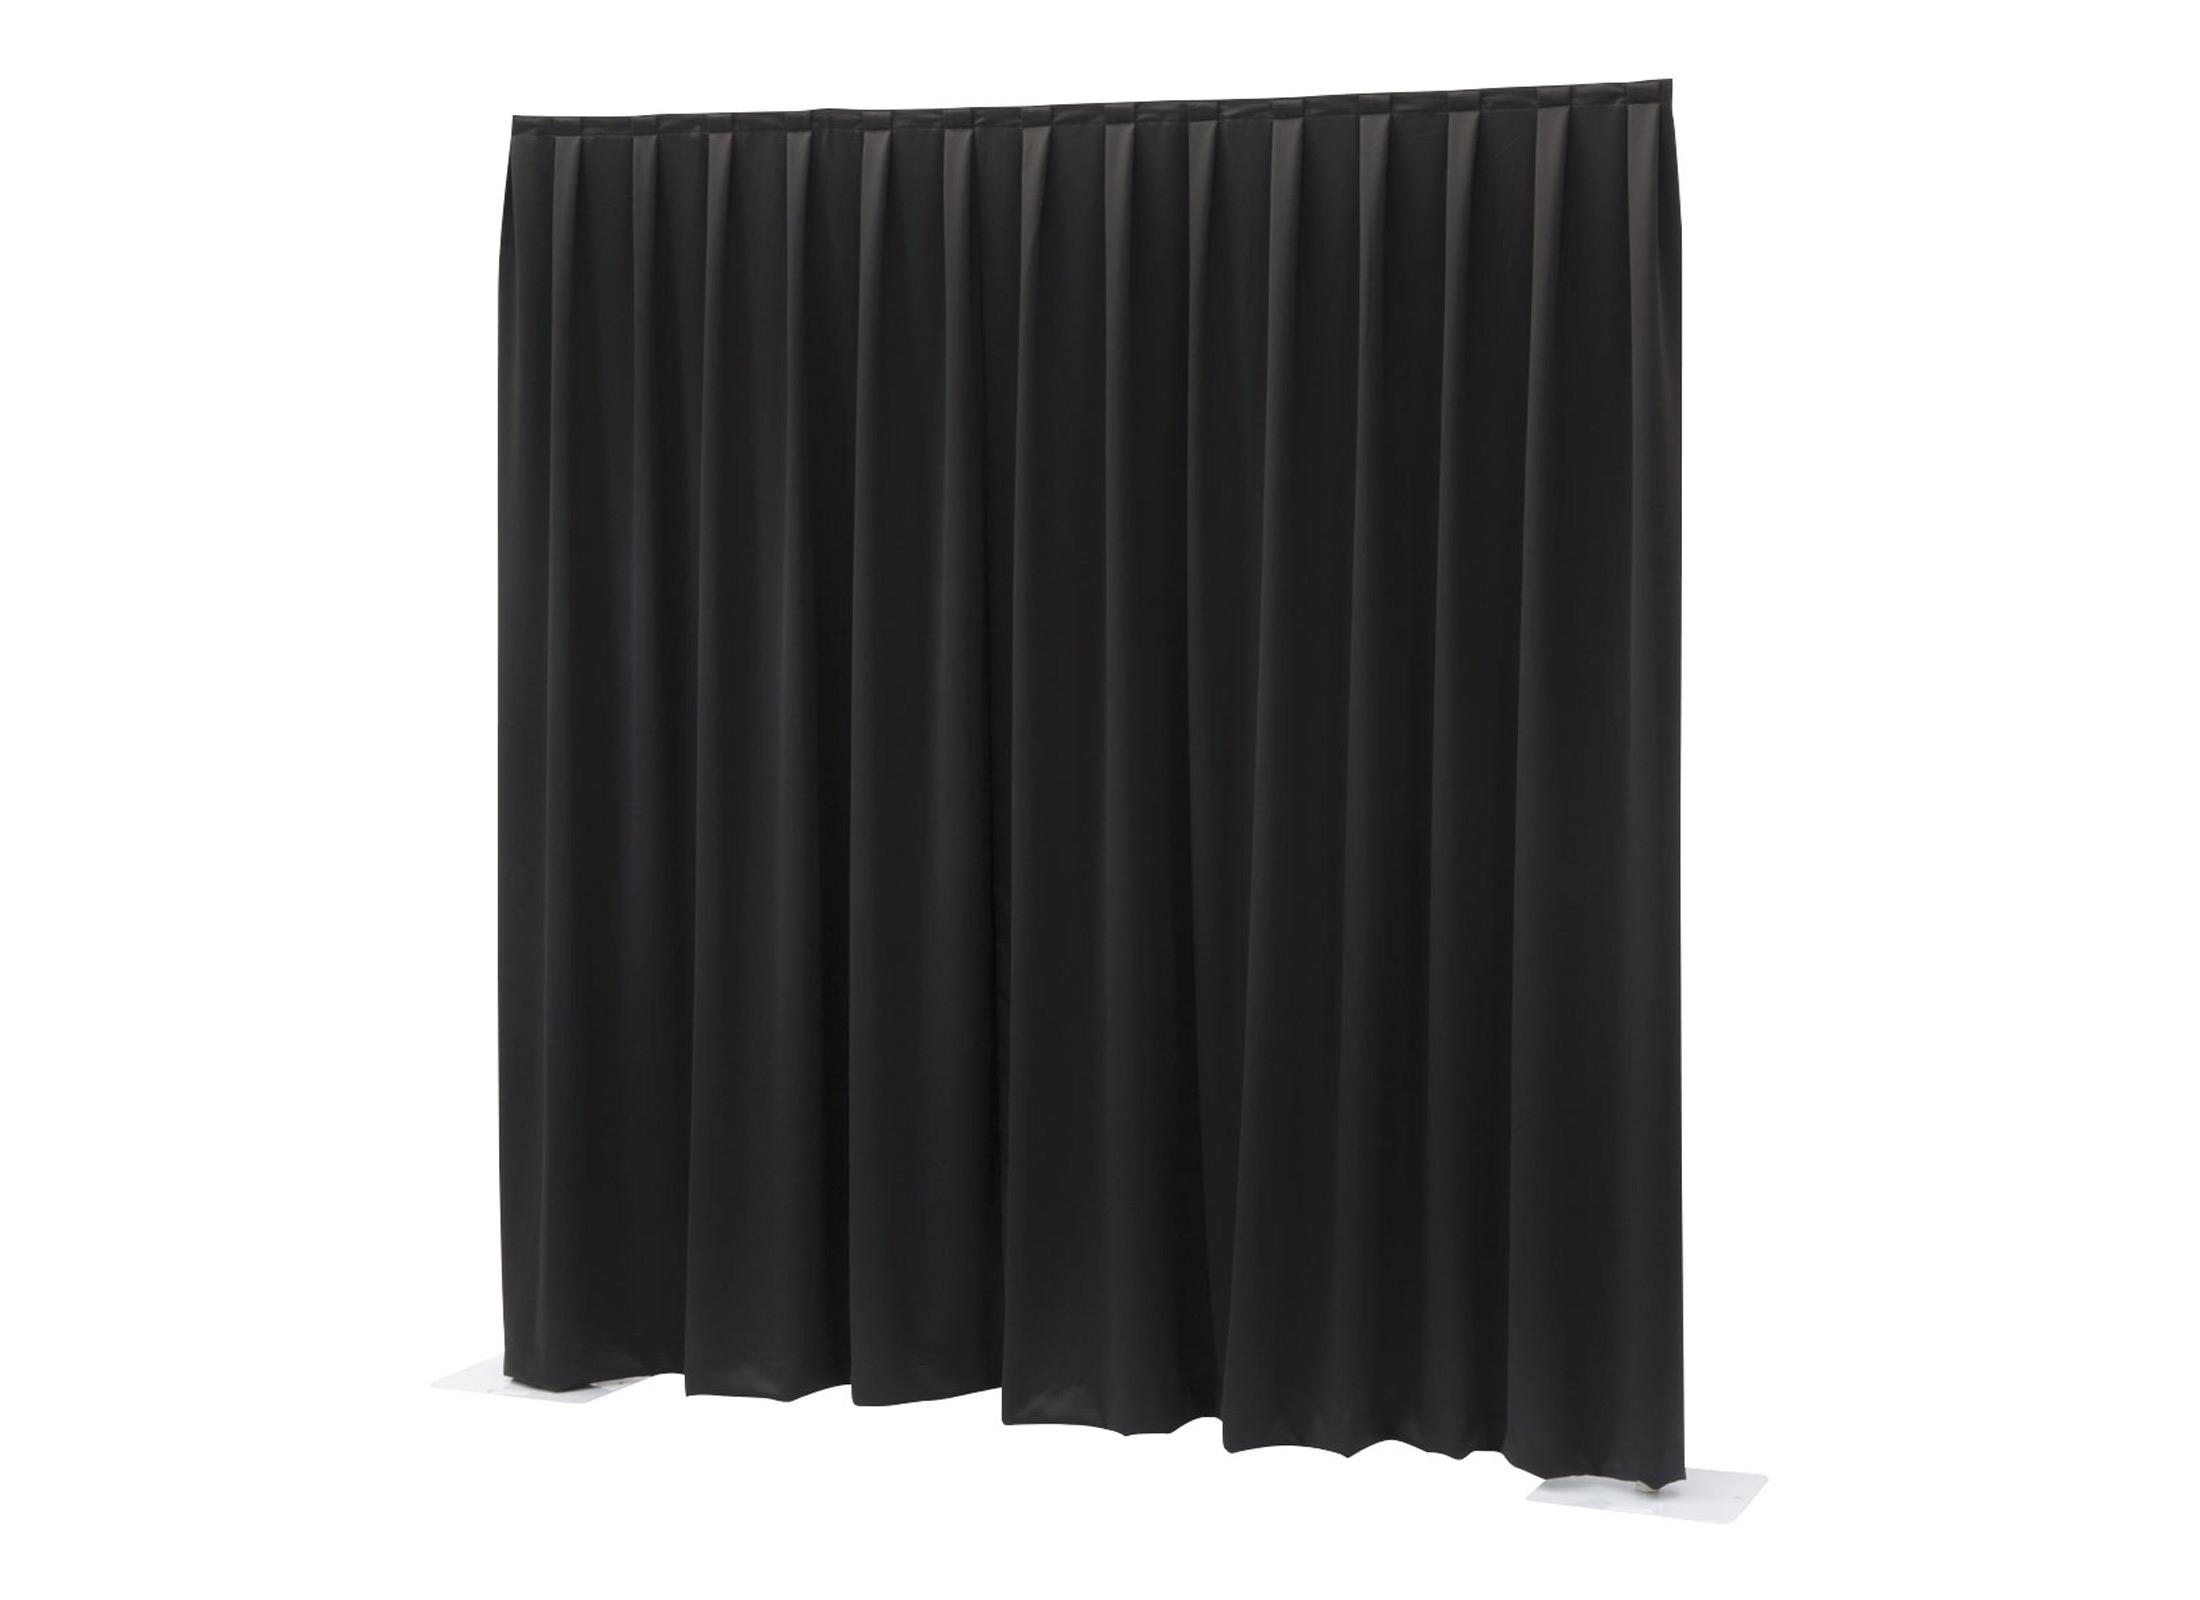 wentex pipes drapes vorhang molton 3x3m 300g m schwarz g nstig online kaufen bei huss. Black Bedroom Furniture Sets. Home Design Ideas